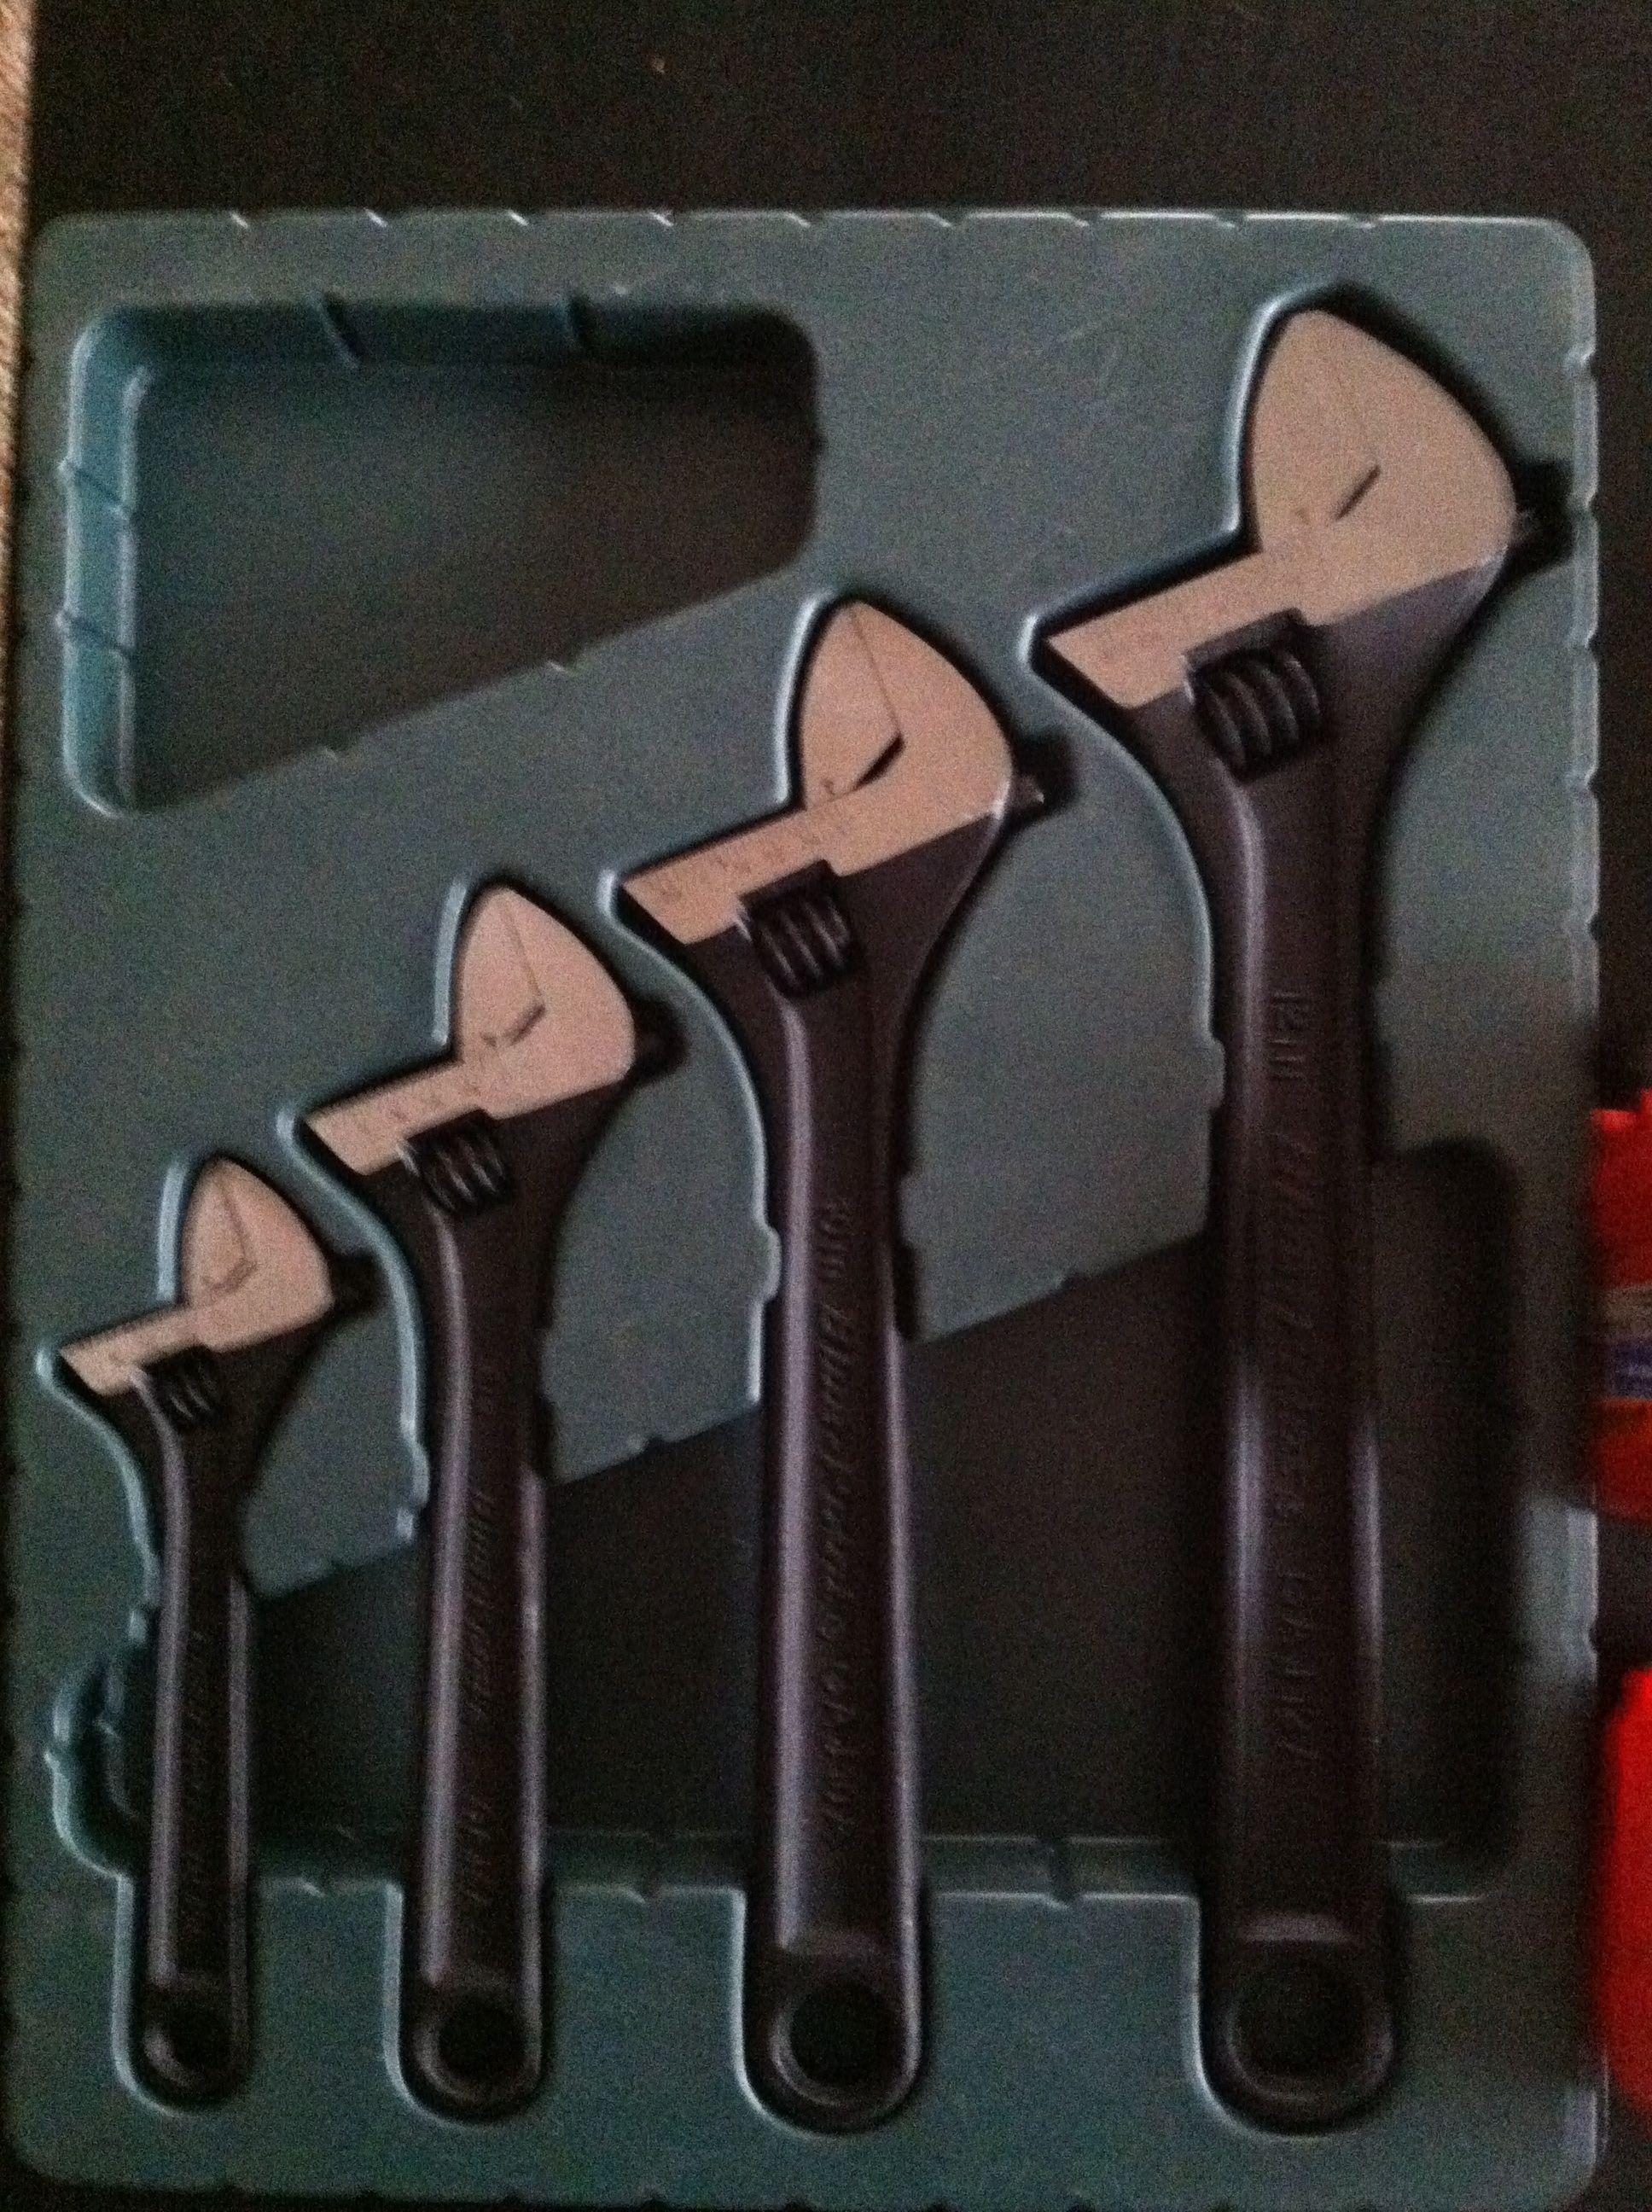 Blue Point Adjustable Wrench Set In Dieselpower S Garage Sale Angola